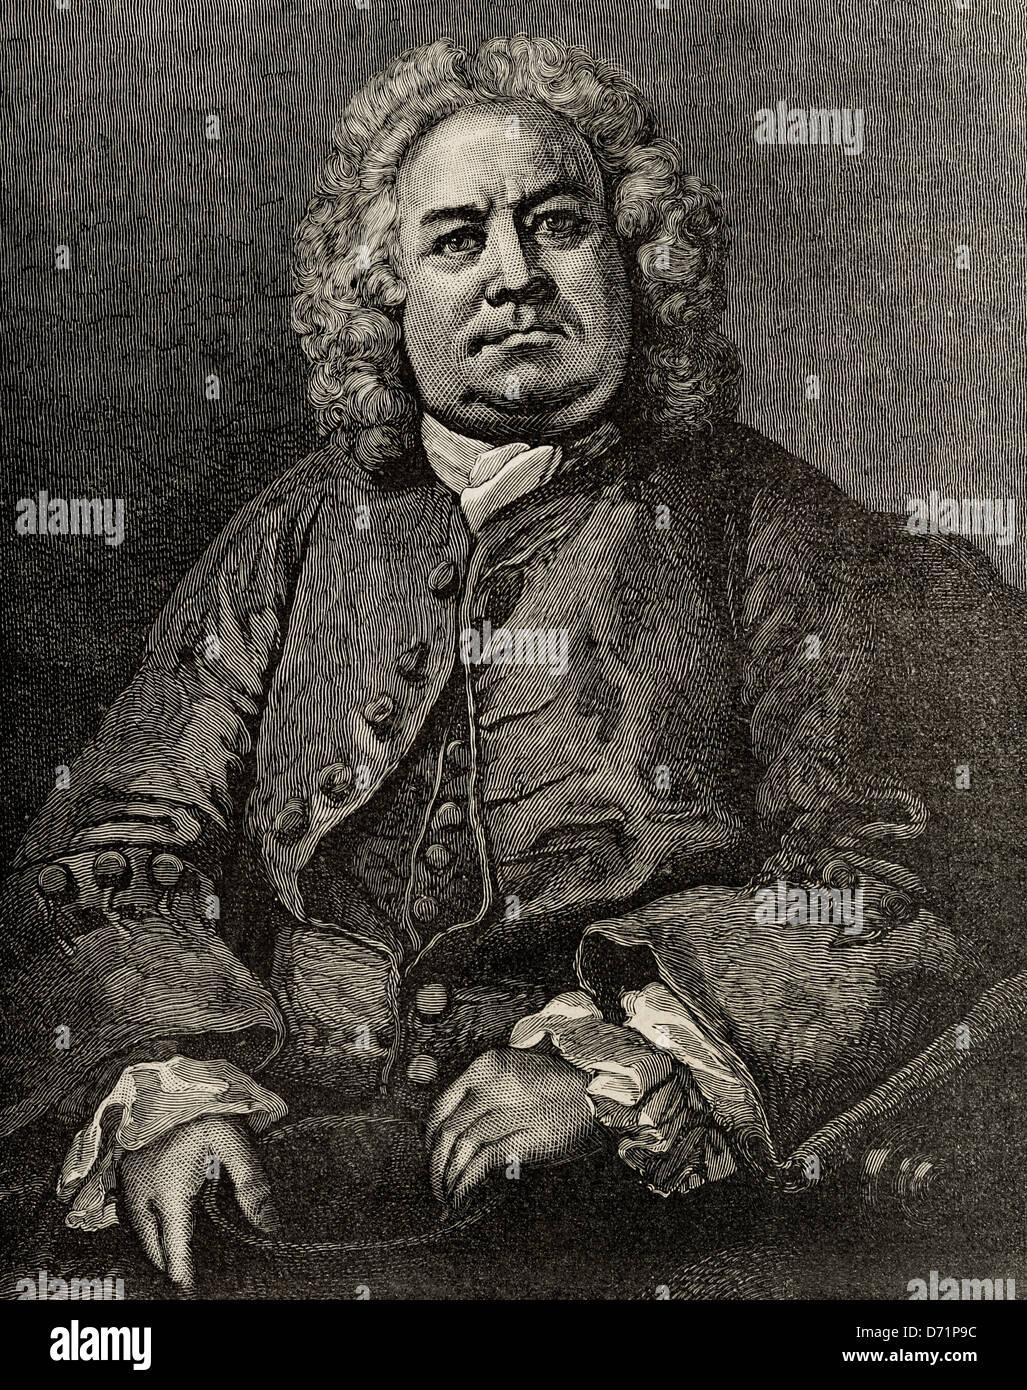 William Hogarth (1697 –1764). English painter, printmaker, pictorial satirist, and engraver. Engraving. Stock Photo